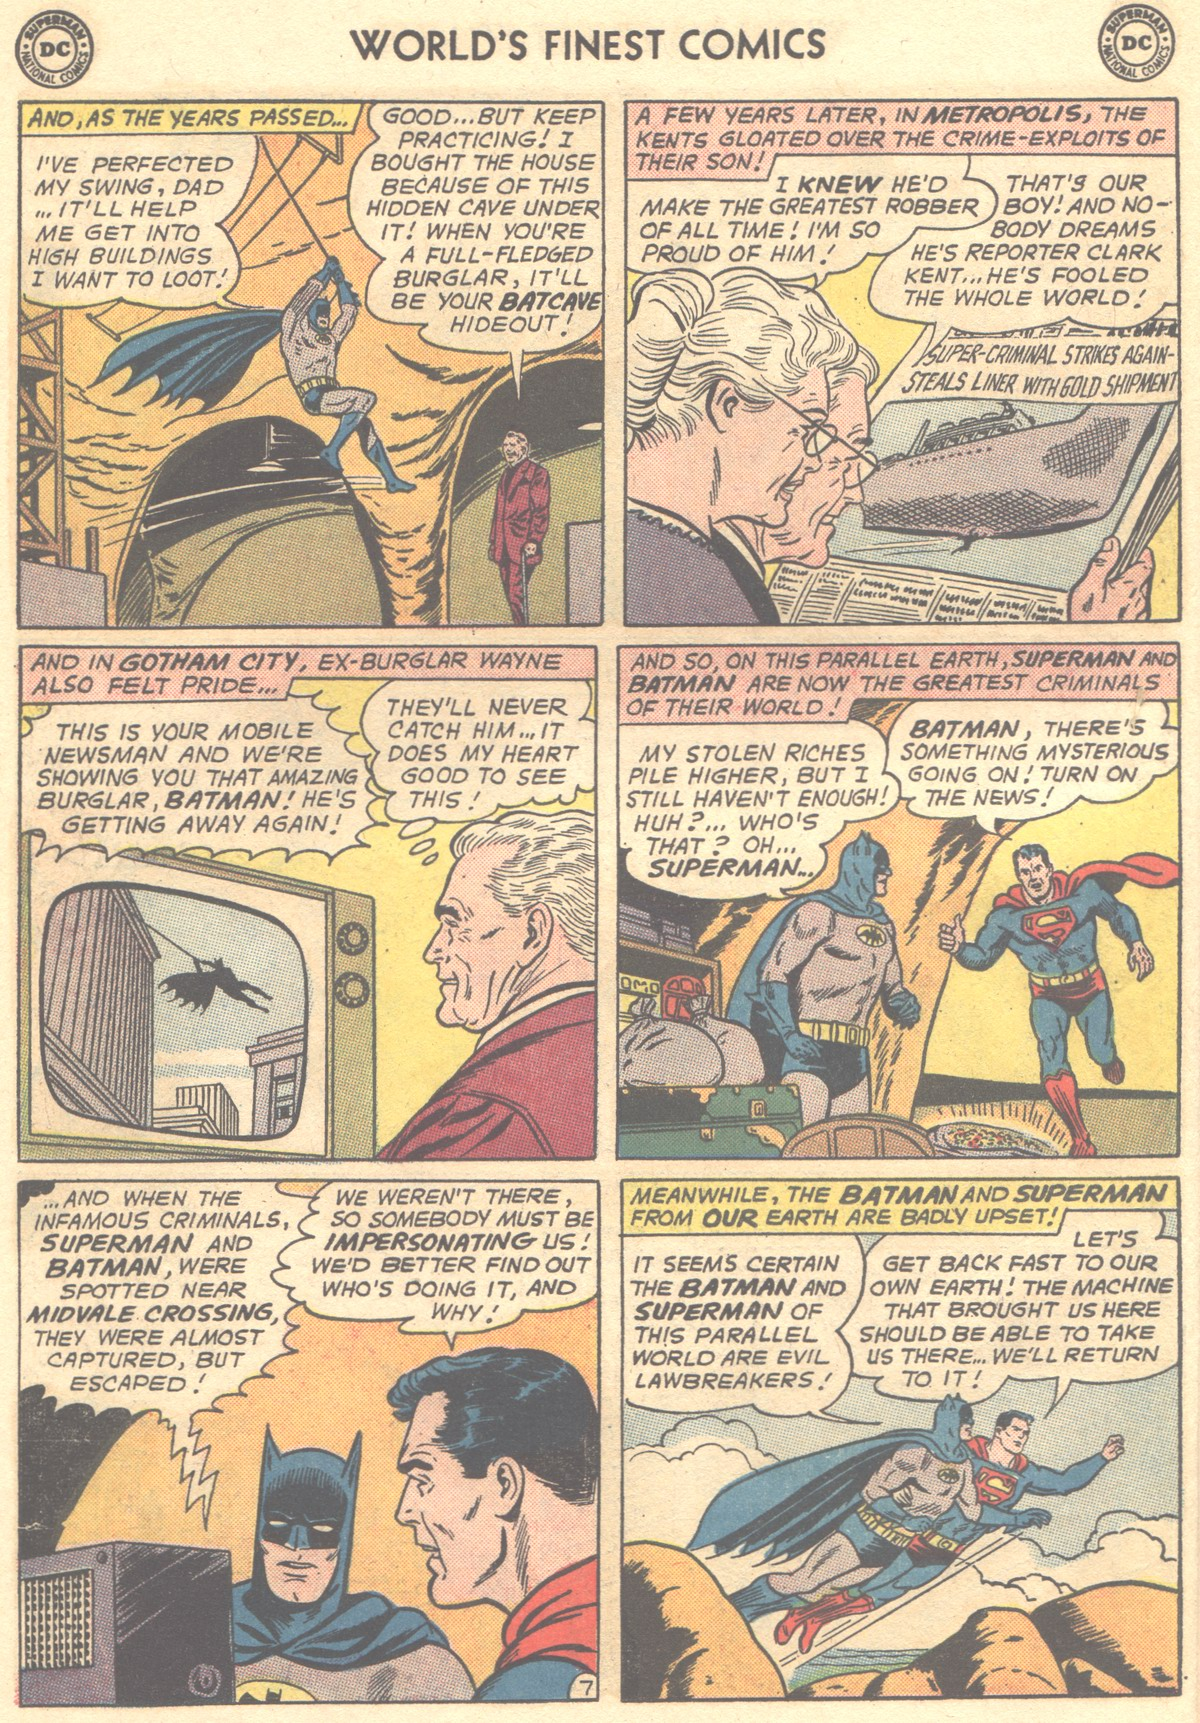 Read online World's Finest Comics comic -  Issue #148 - 10